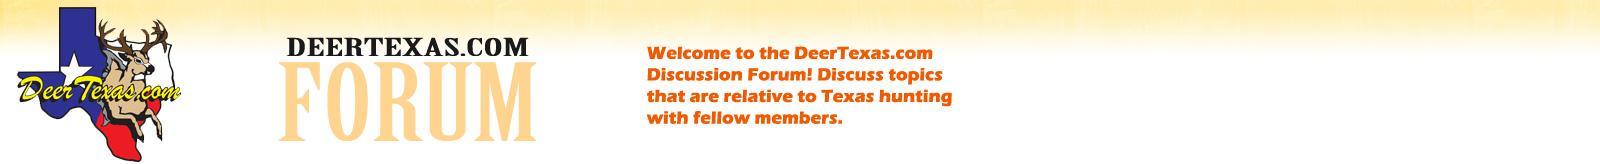 Click Here to visit Deertexas.com!